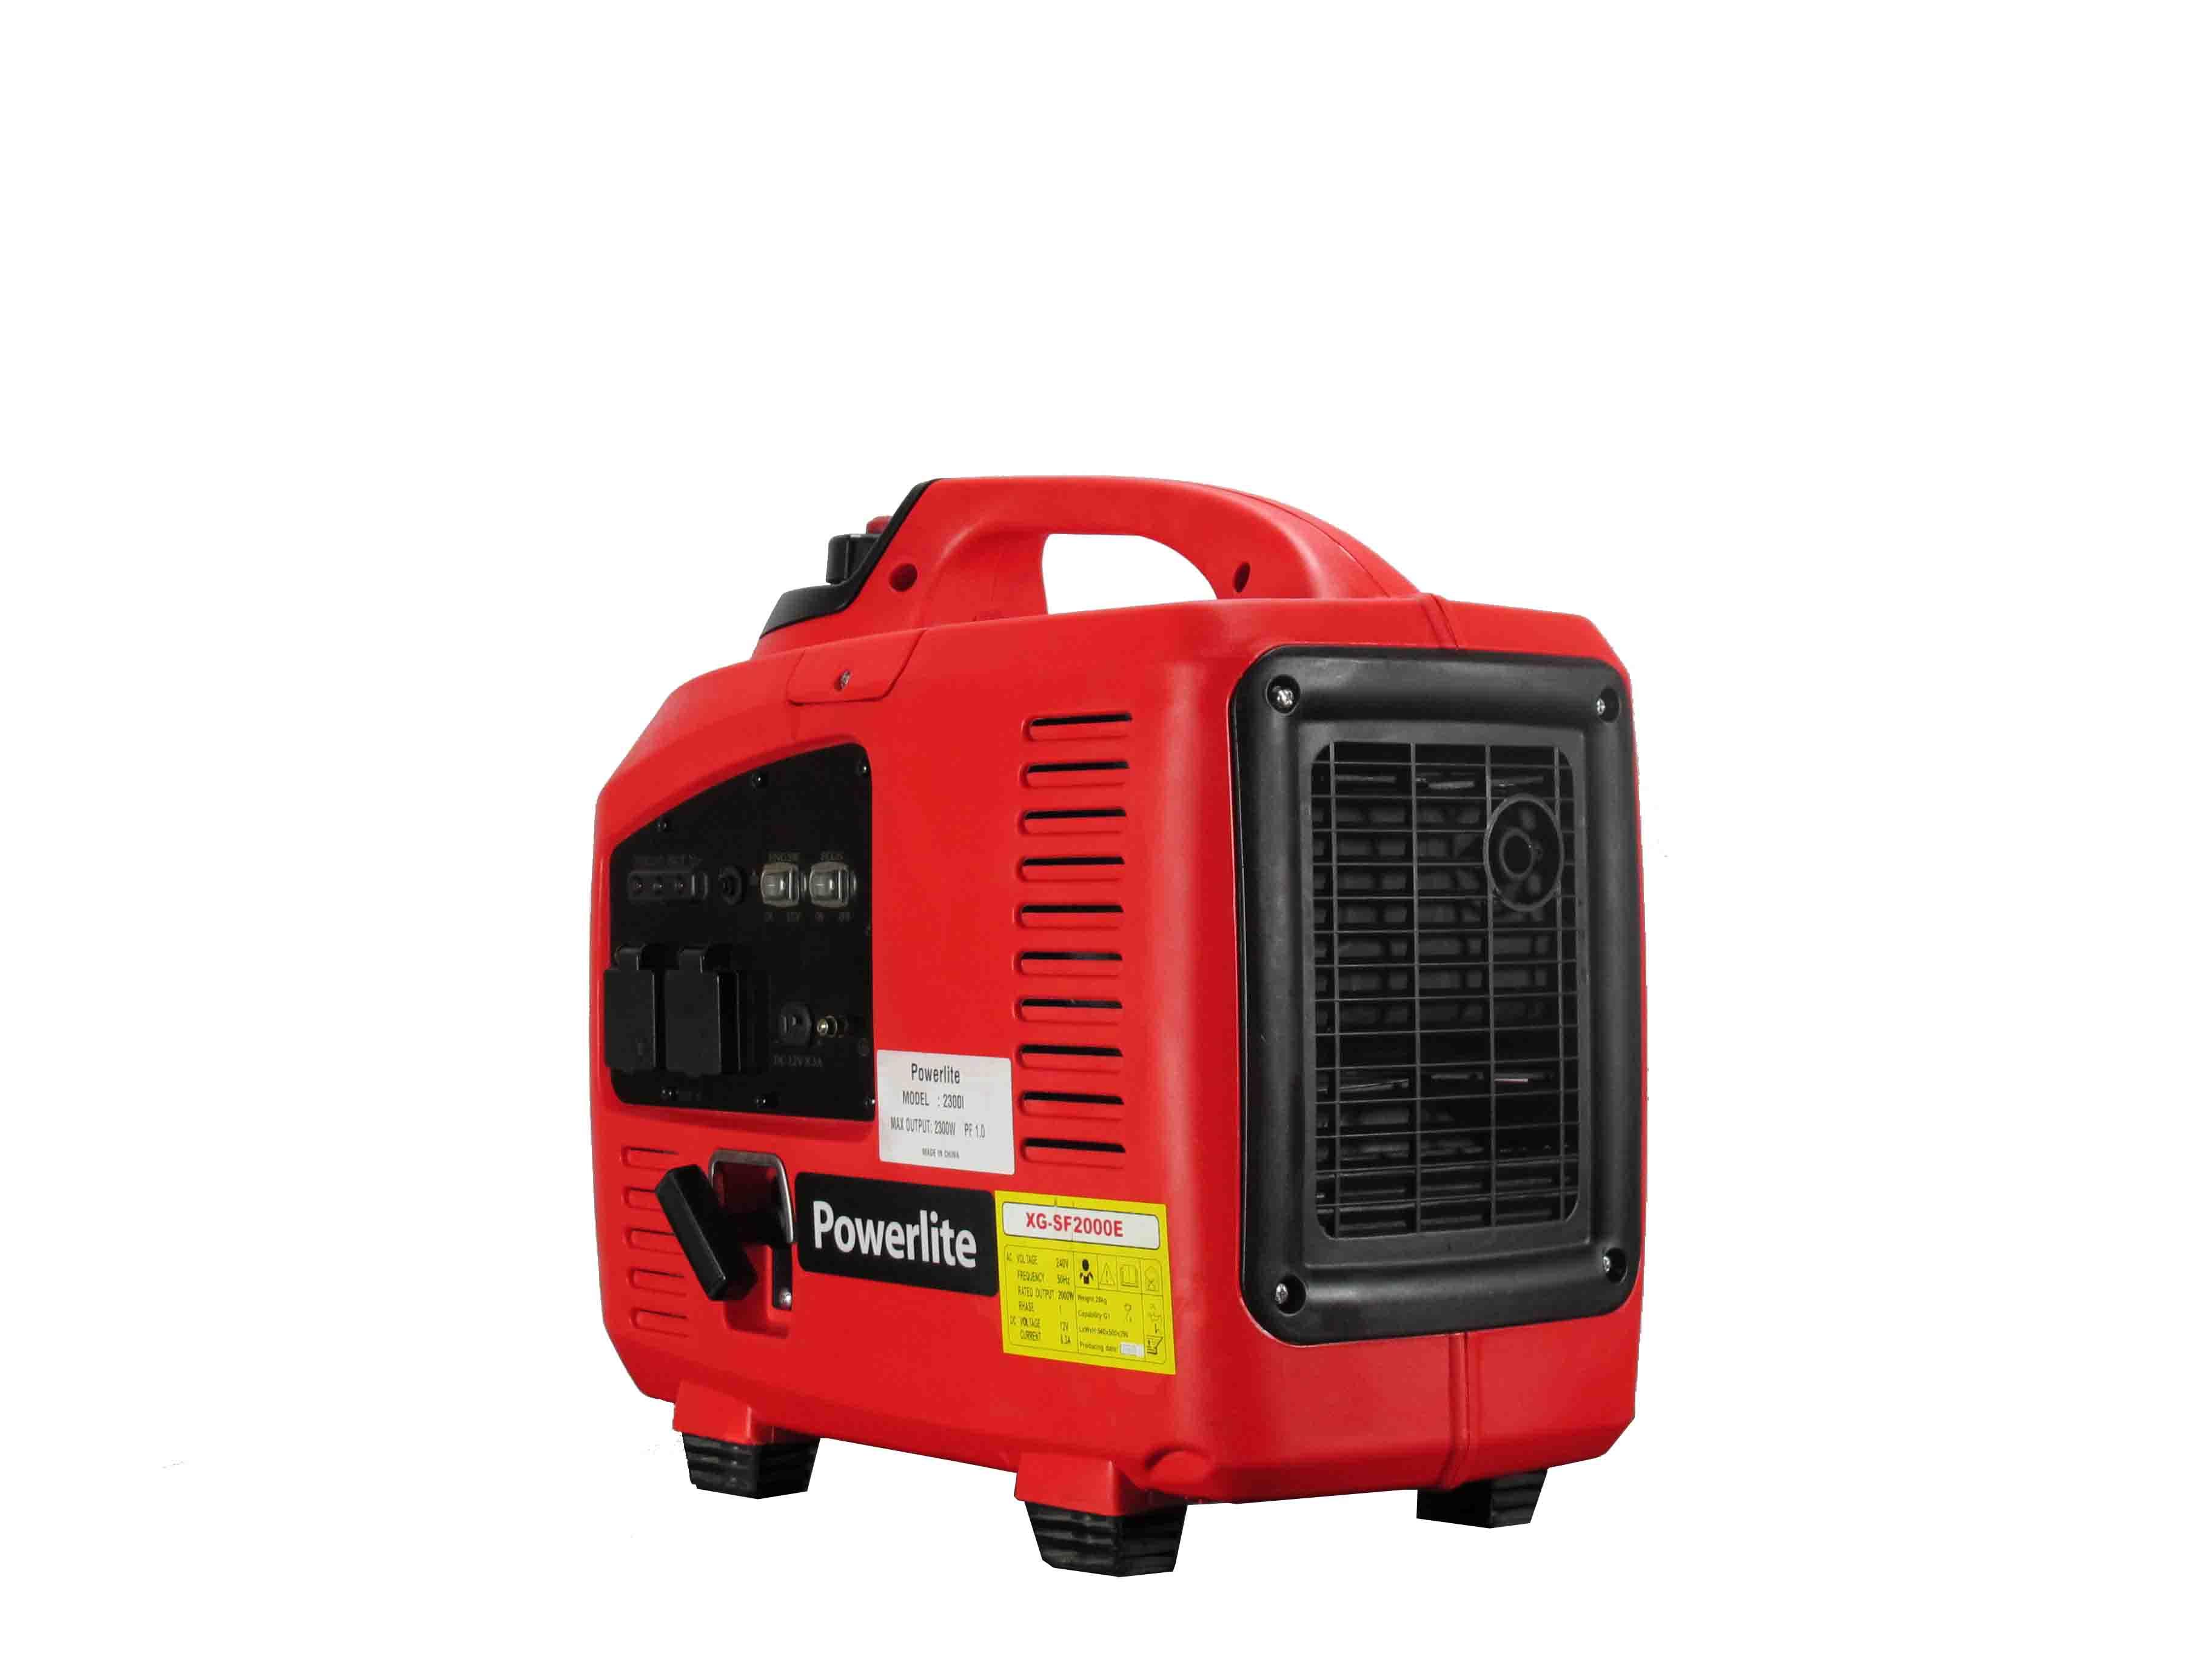 2300i – 2300W Inverter Generator